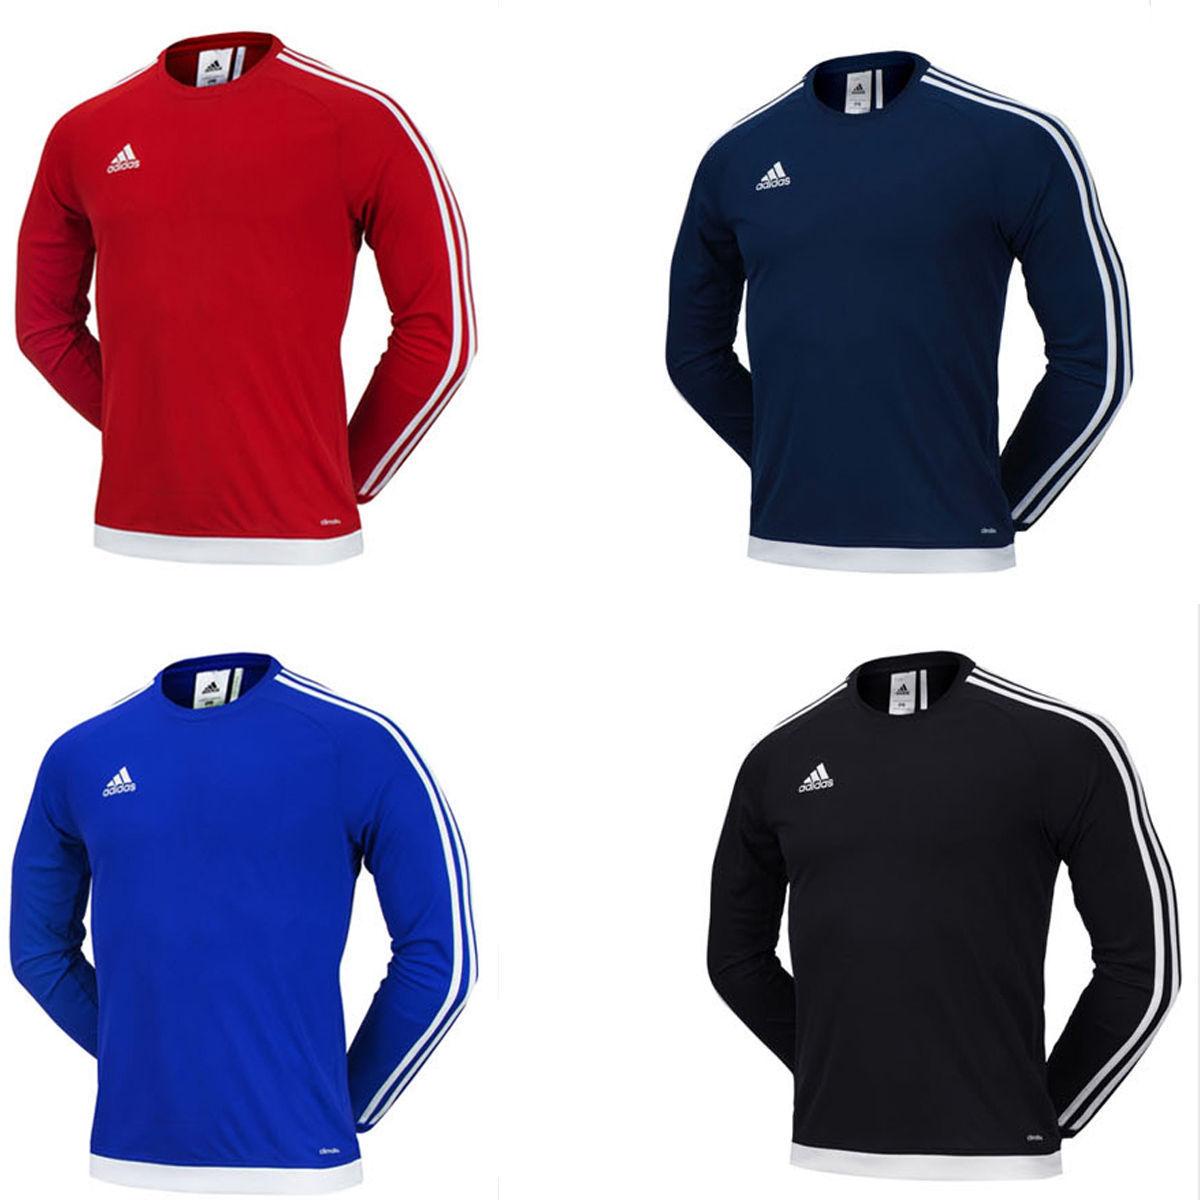 99e4c602623 Adidas Estro 15 Jersey Long Sleeve Training and 32 similar items.  60ba3002fe0ceb792cc4e79b6c8c7eb98a7a7629.  60ba3002fe0ceb792cc4e79b6c8c7eb98a7a7629